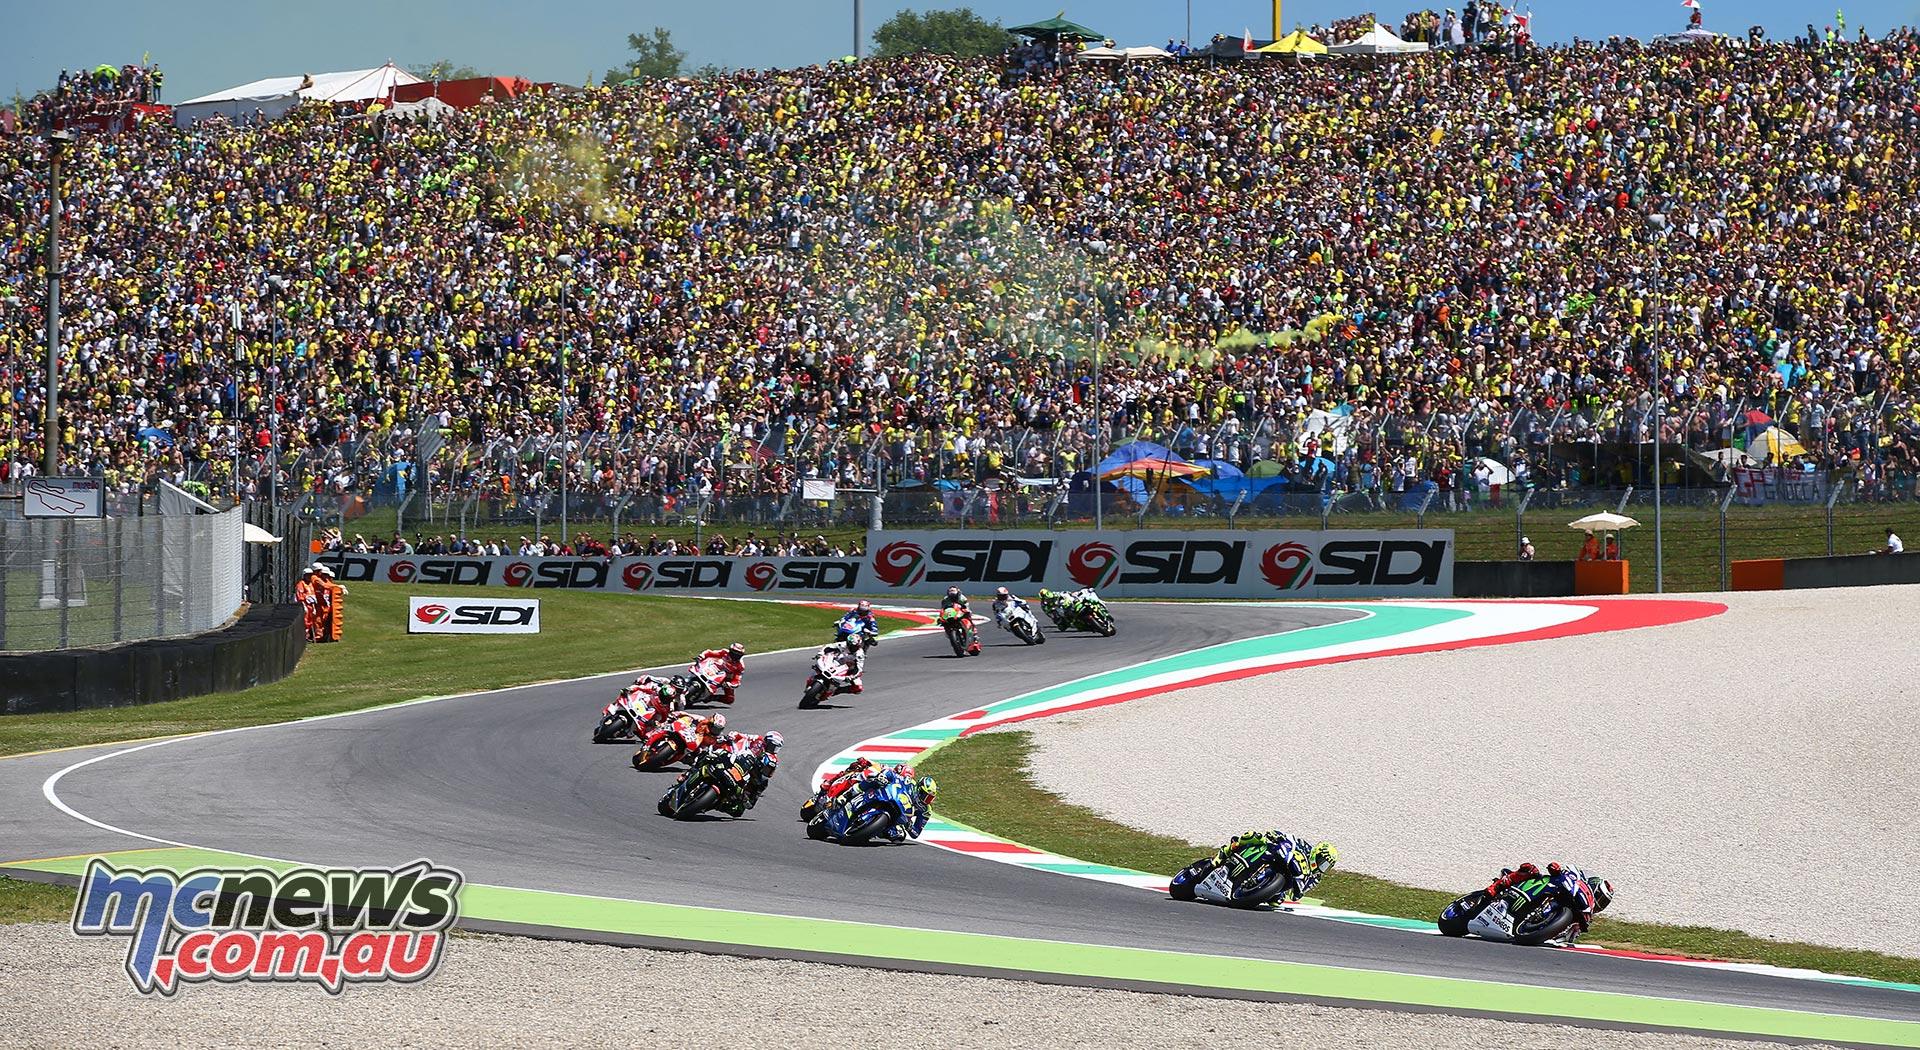 MotoGP Mugello 2016 - Image by AJRN